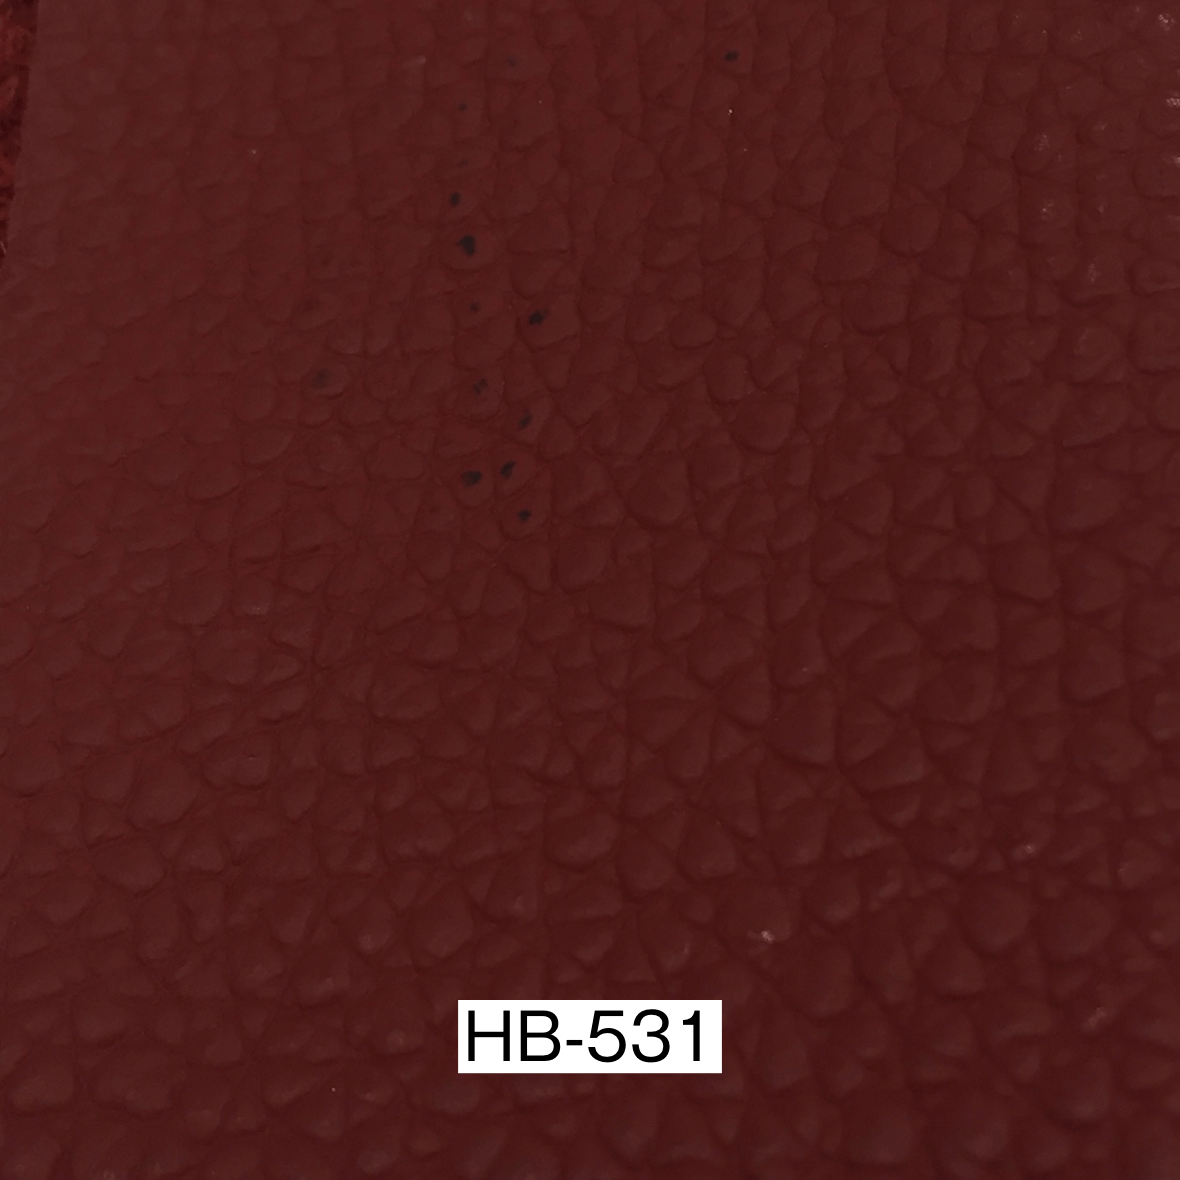 ERベイカー2 HB531革サンプル